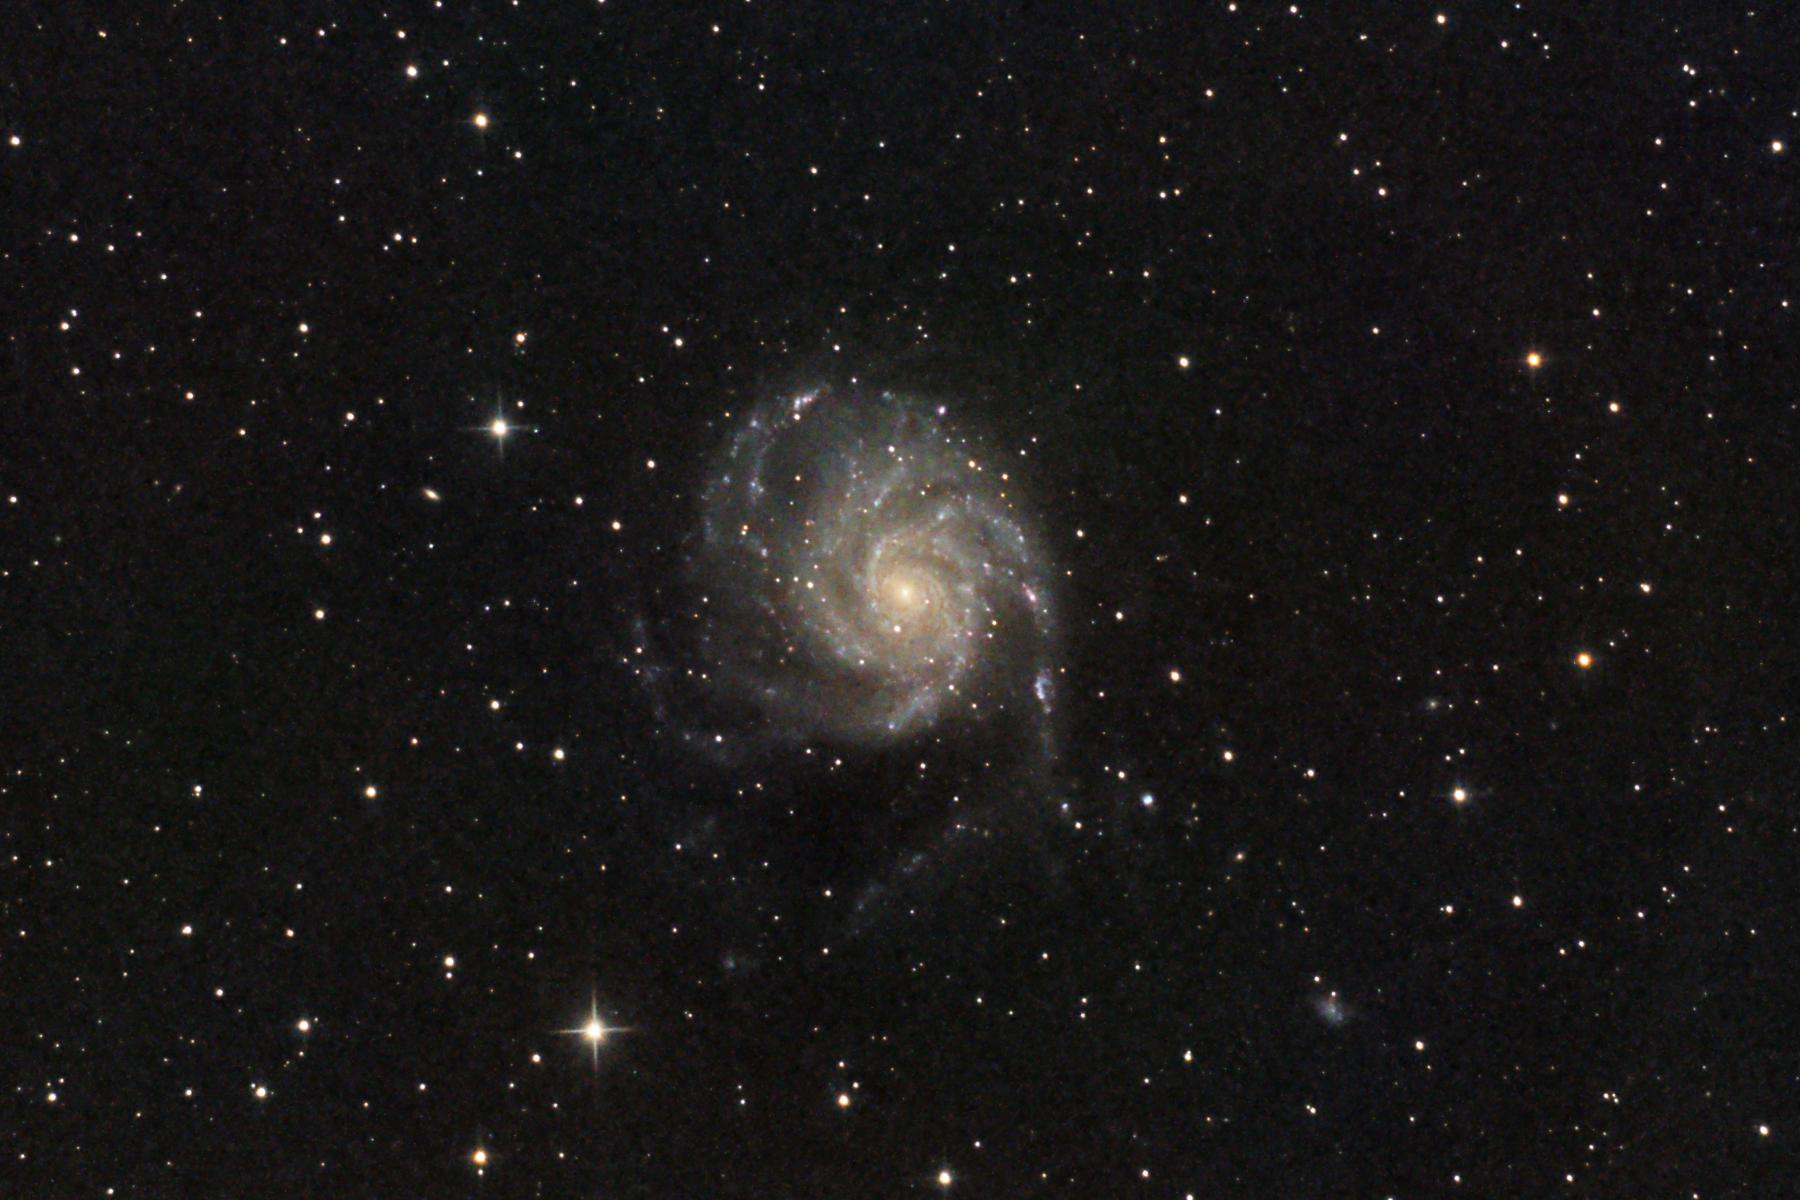 M101 again